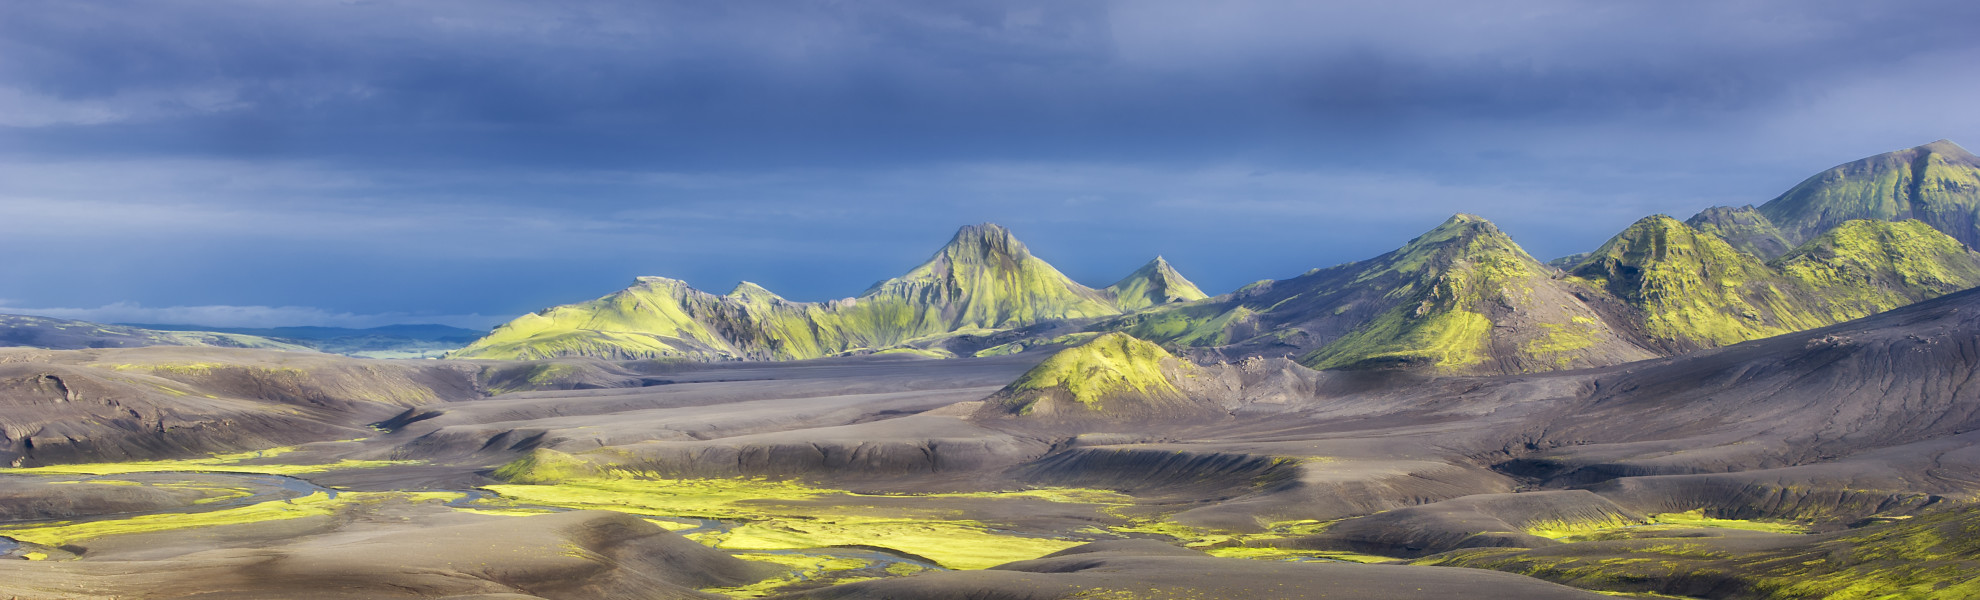 Island - Atemberaubende Landschaften